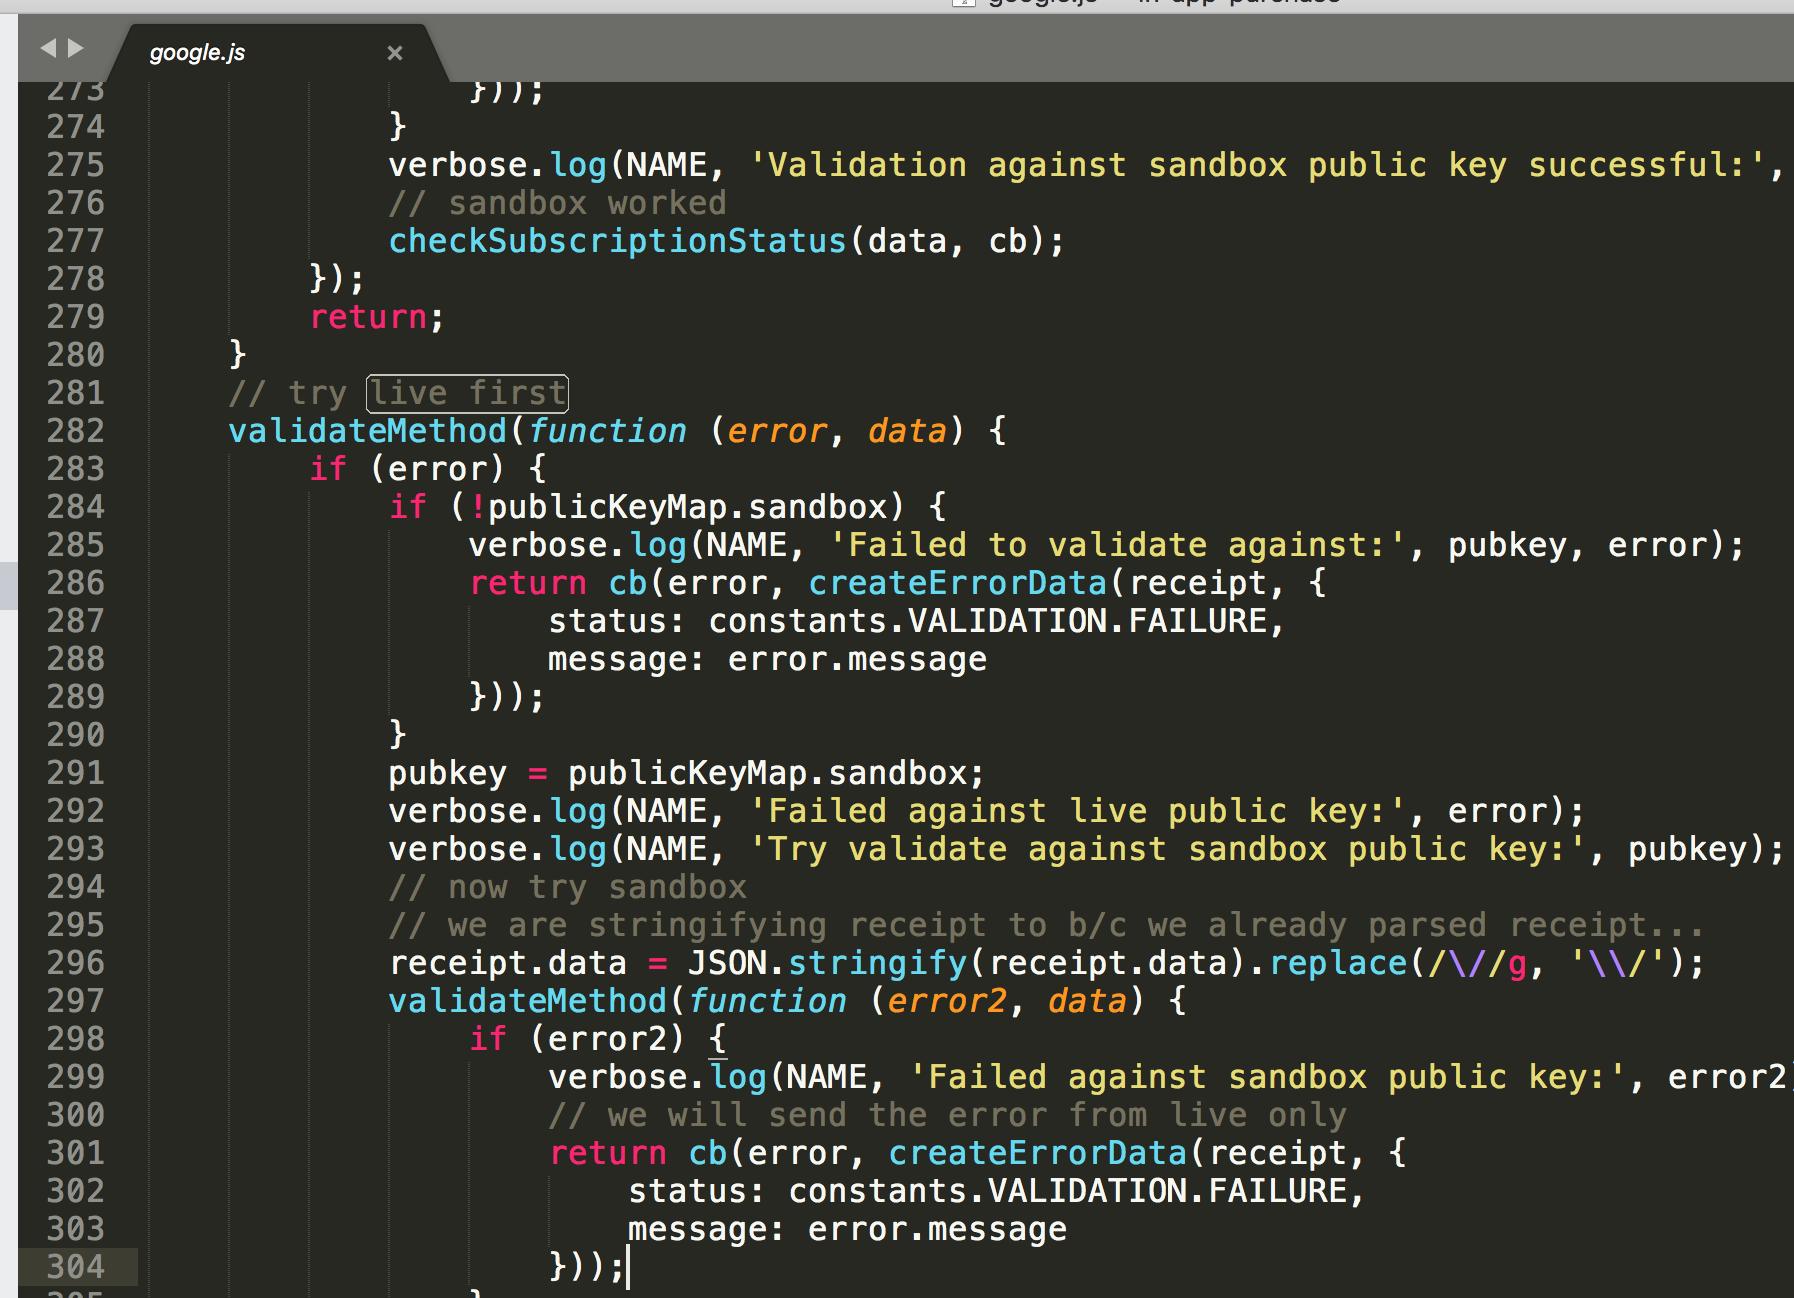 loss error info in google-play · Issue #243 · voltrue2/in